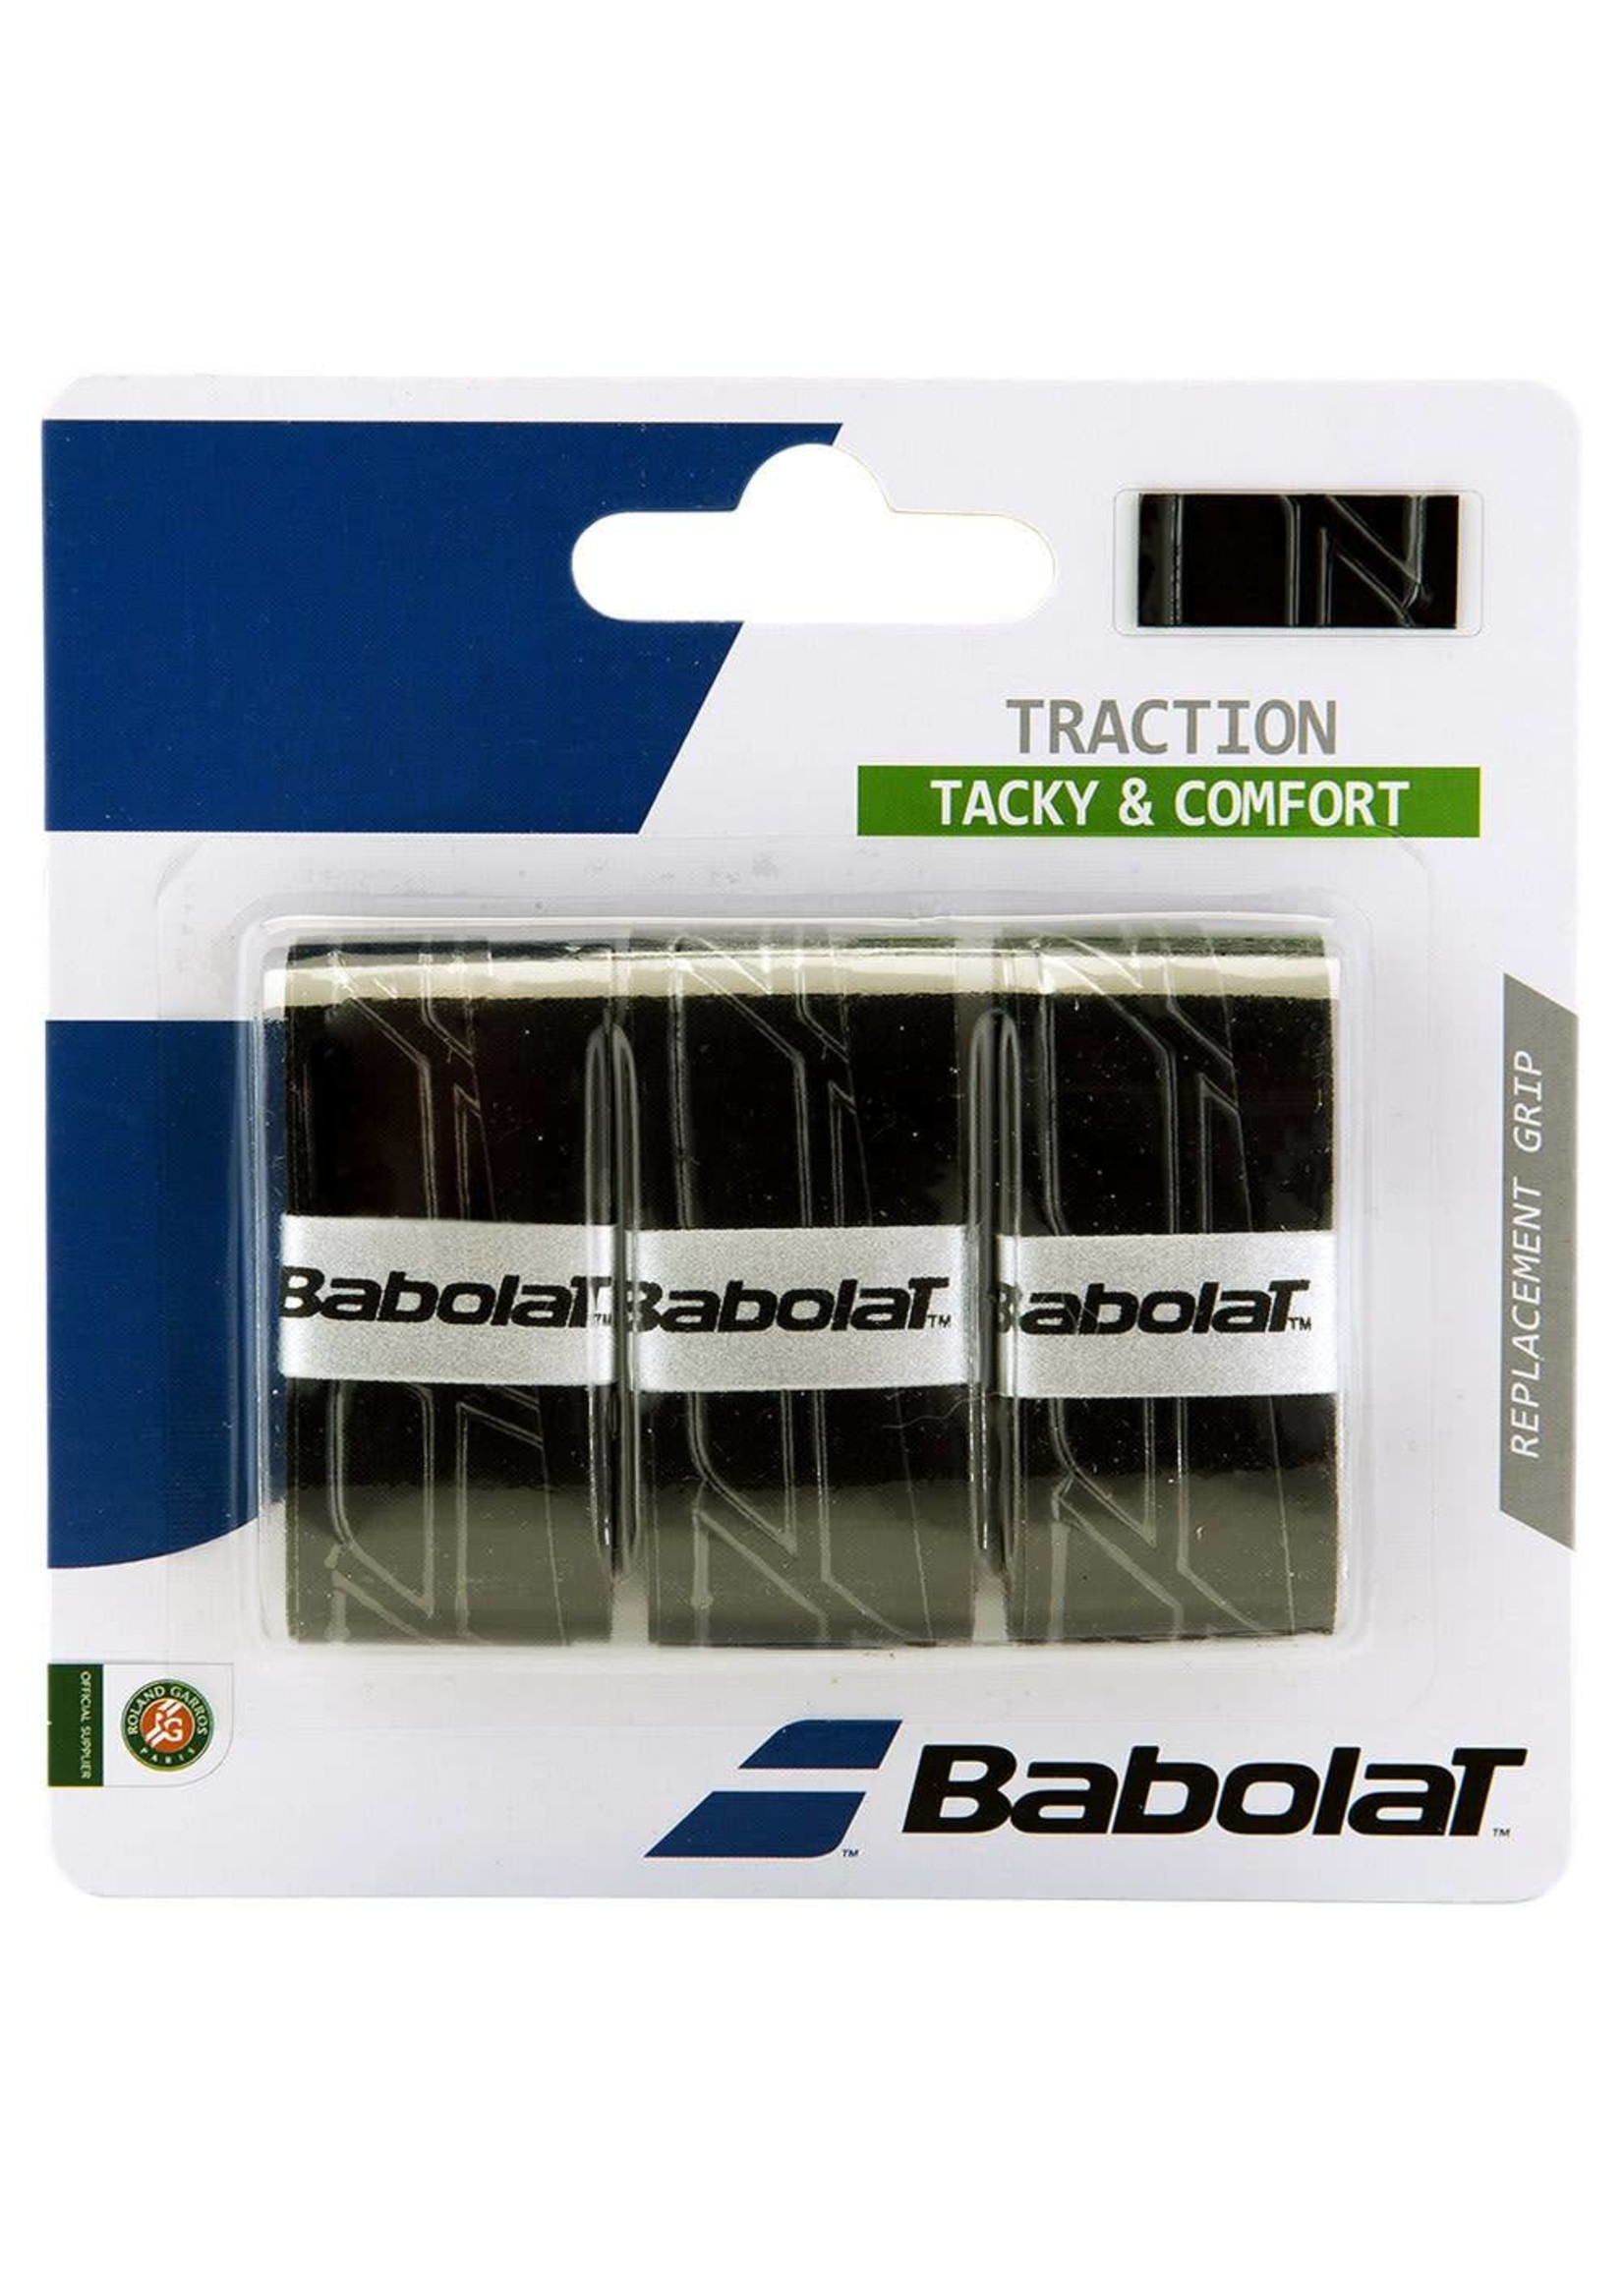 Babolat Babolat Traction Overgrips - 3 pack